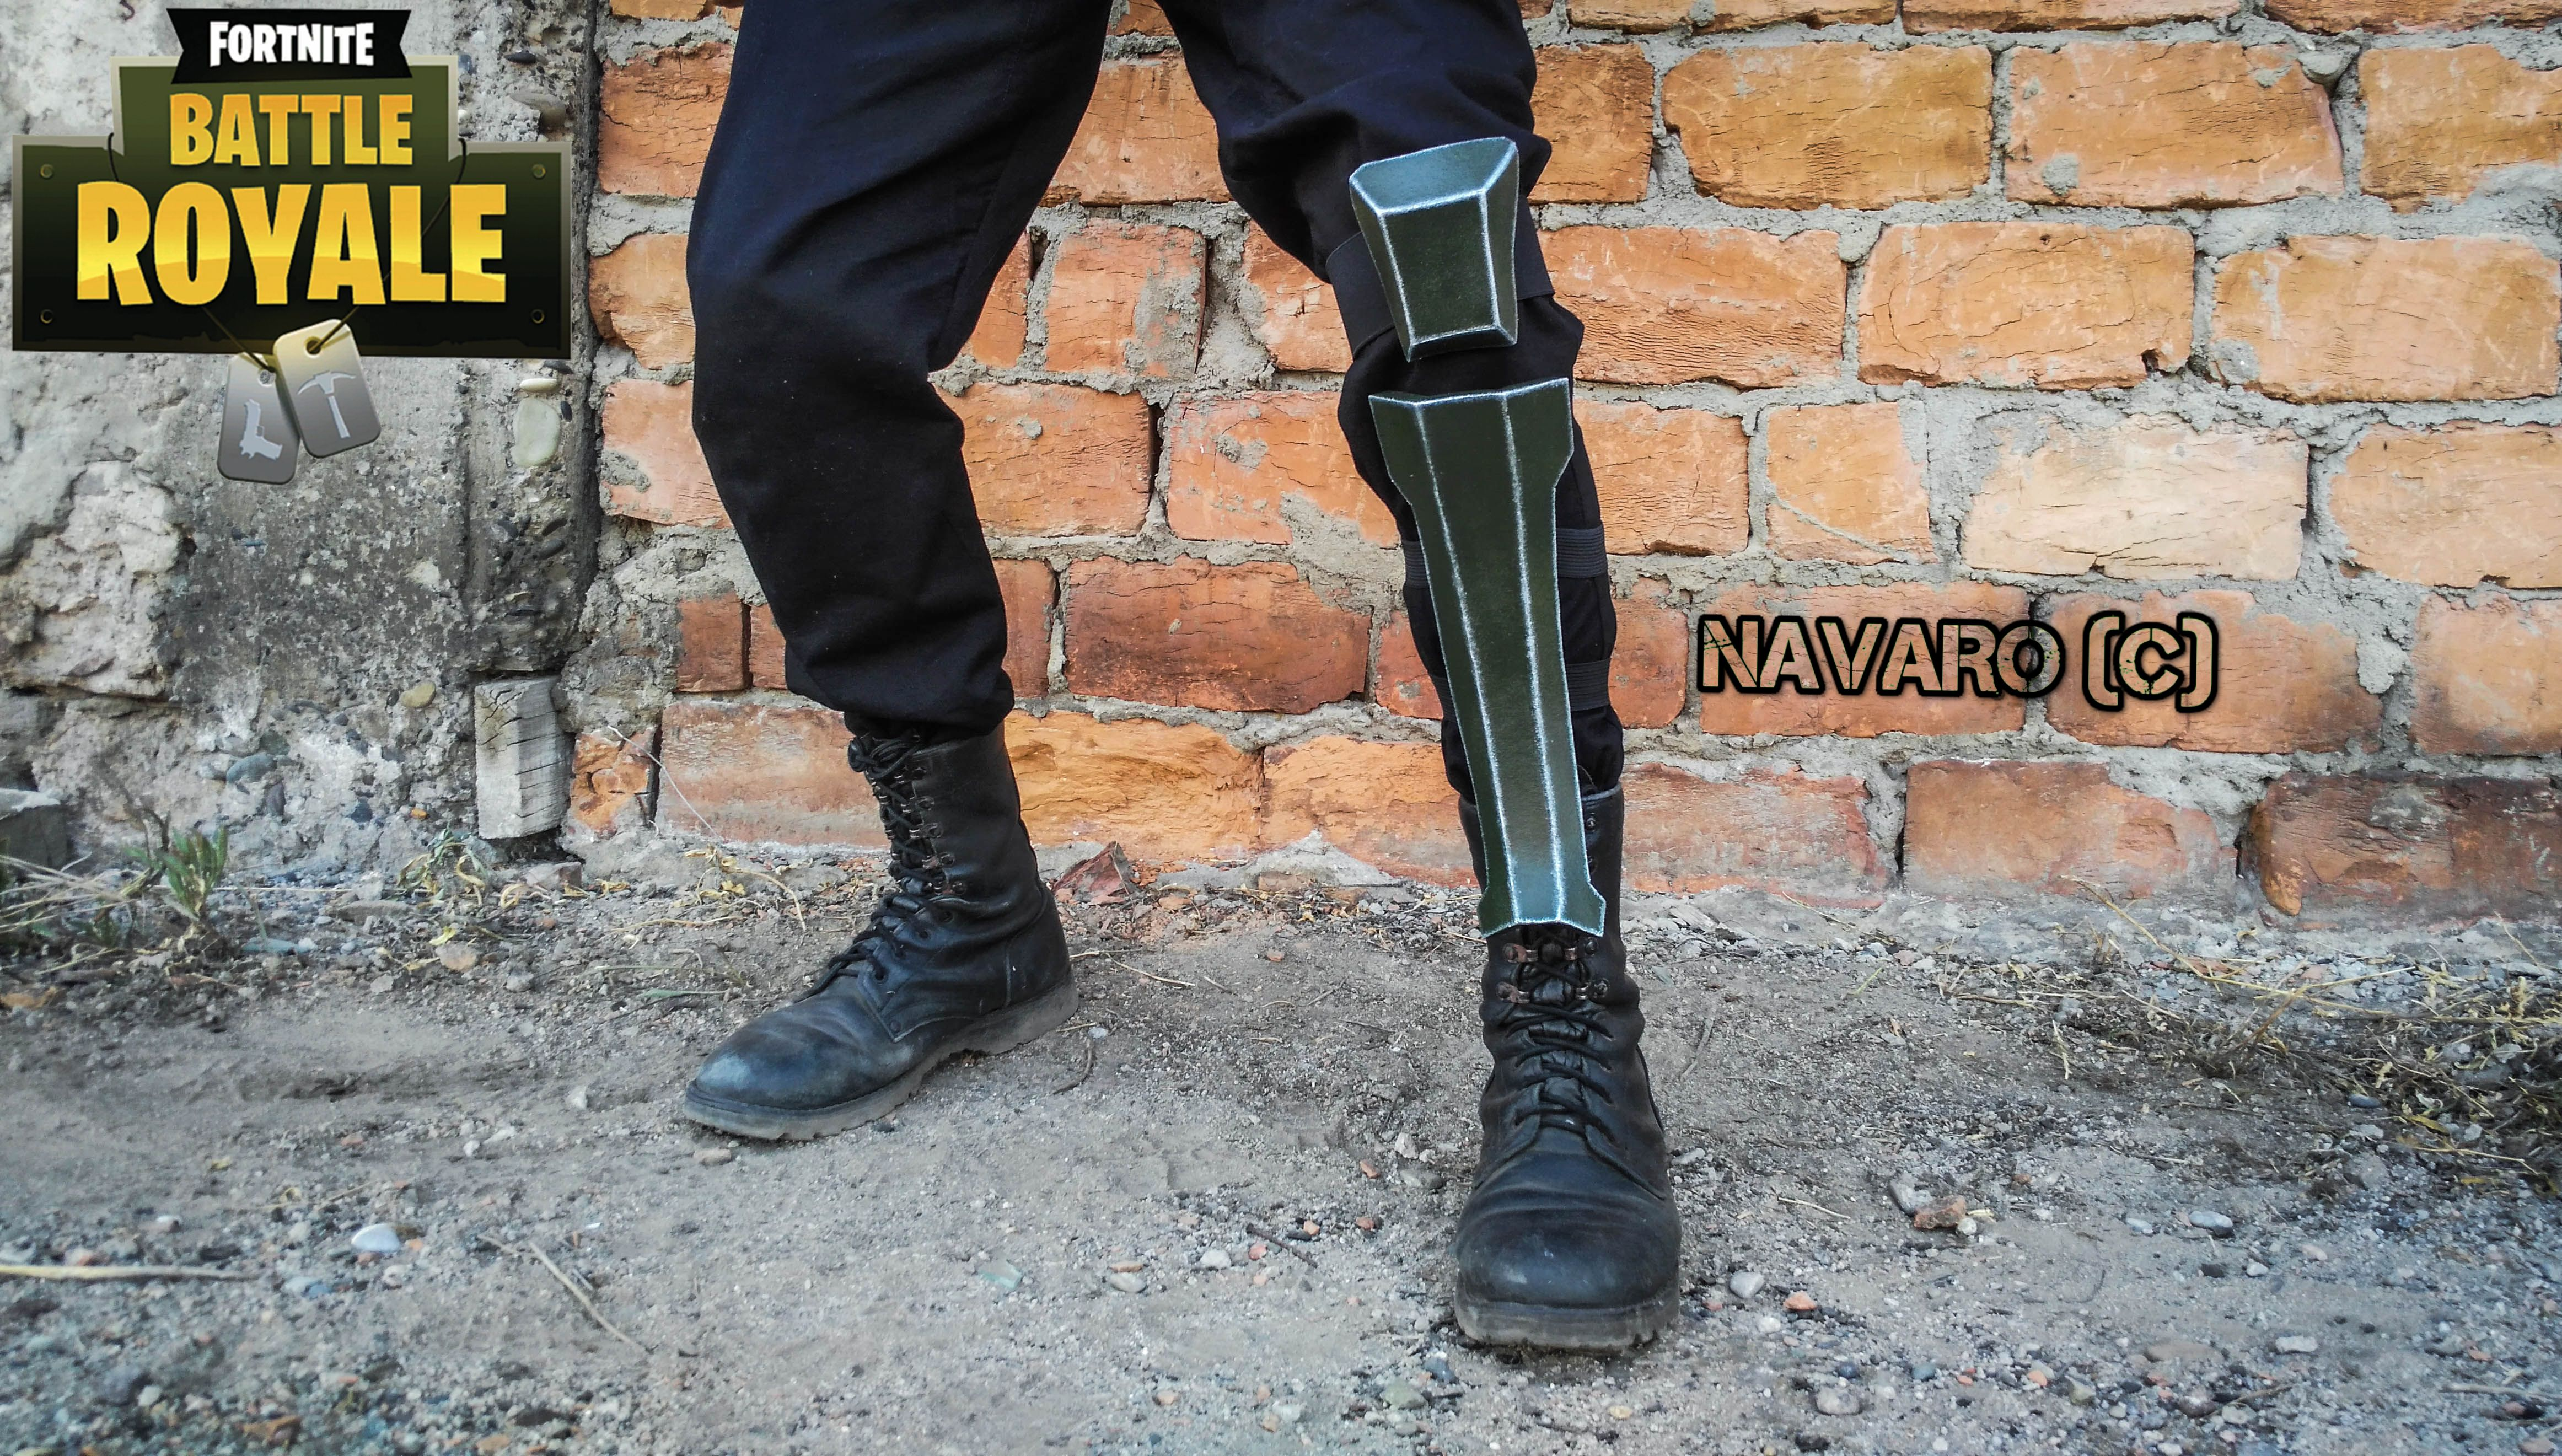 FORTNITE Cosplay - Shin Guards Armor - Fortnite Armor ...